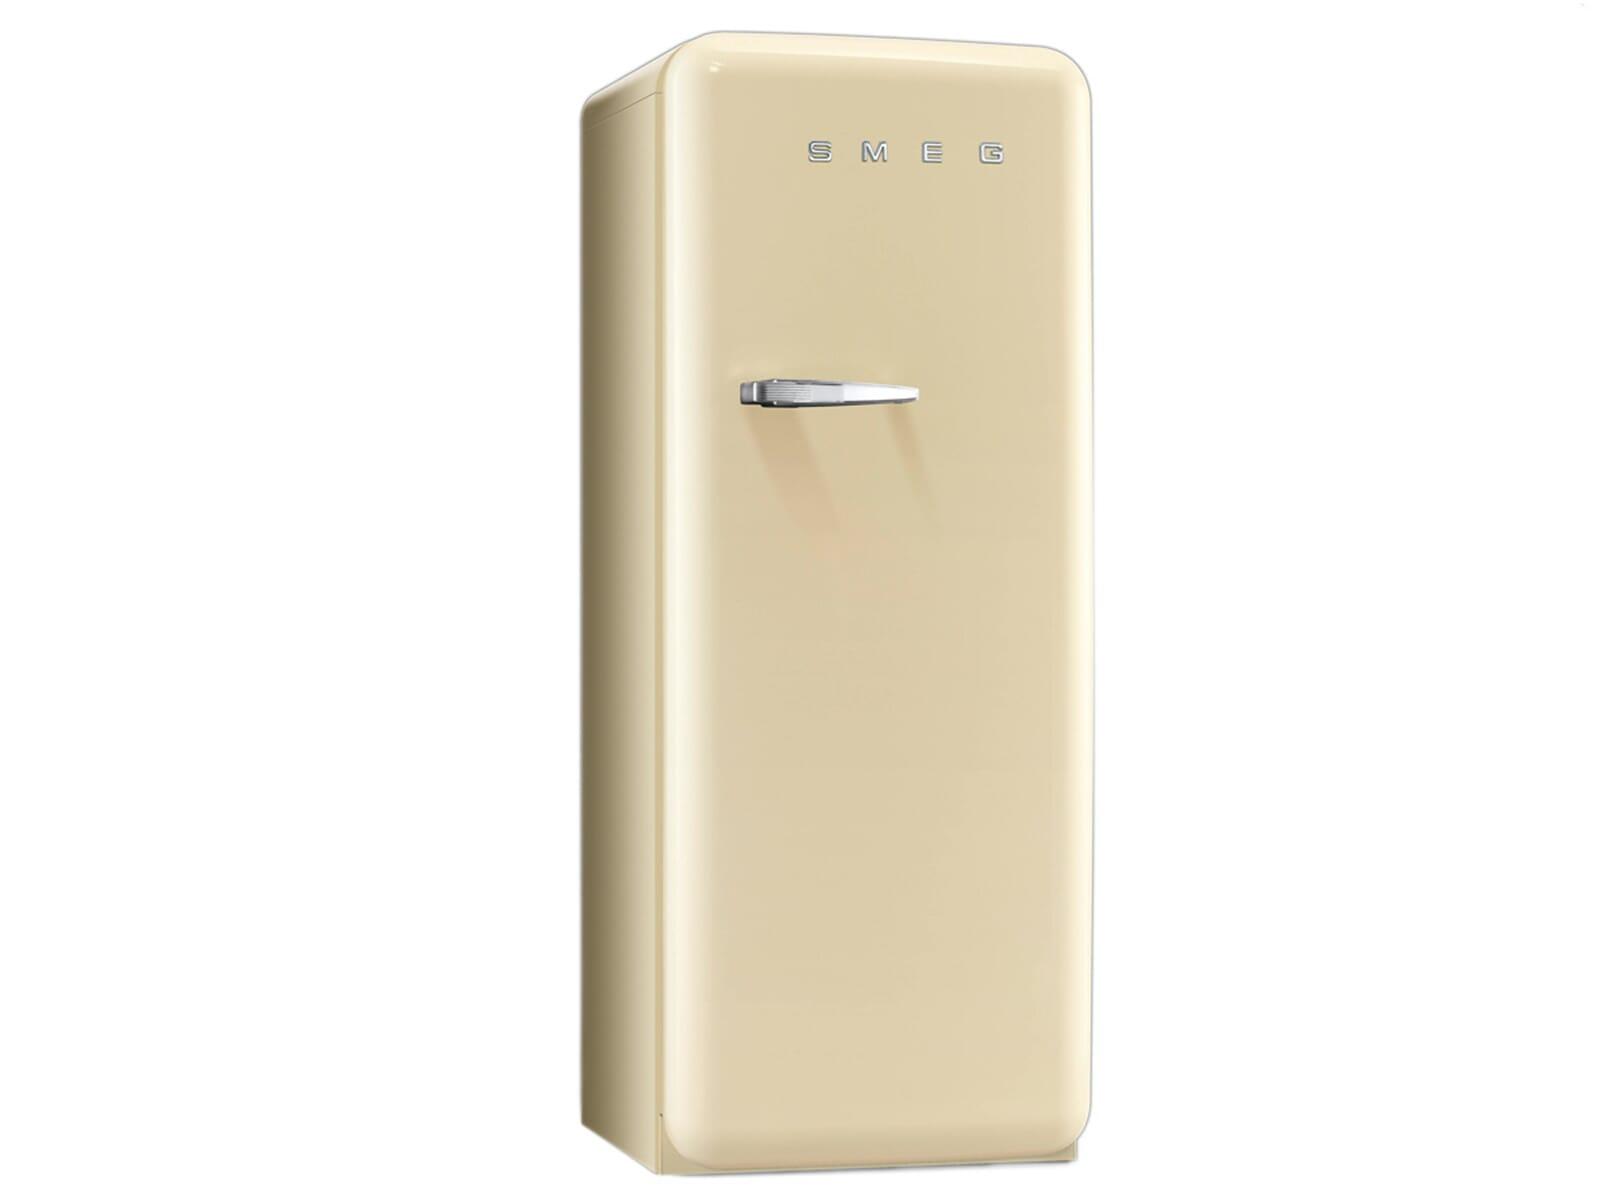 Smeg Kühlschrank Zu Laut : Smeg cvb rp standgefrierschrank creme